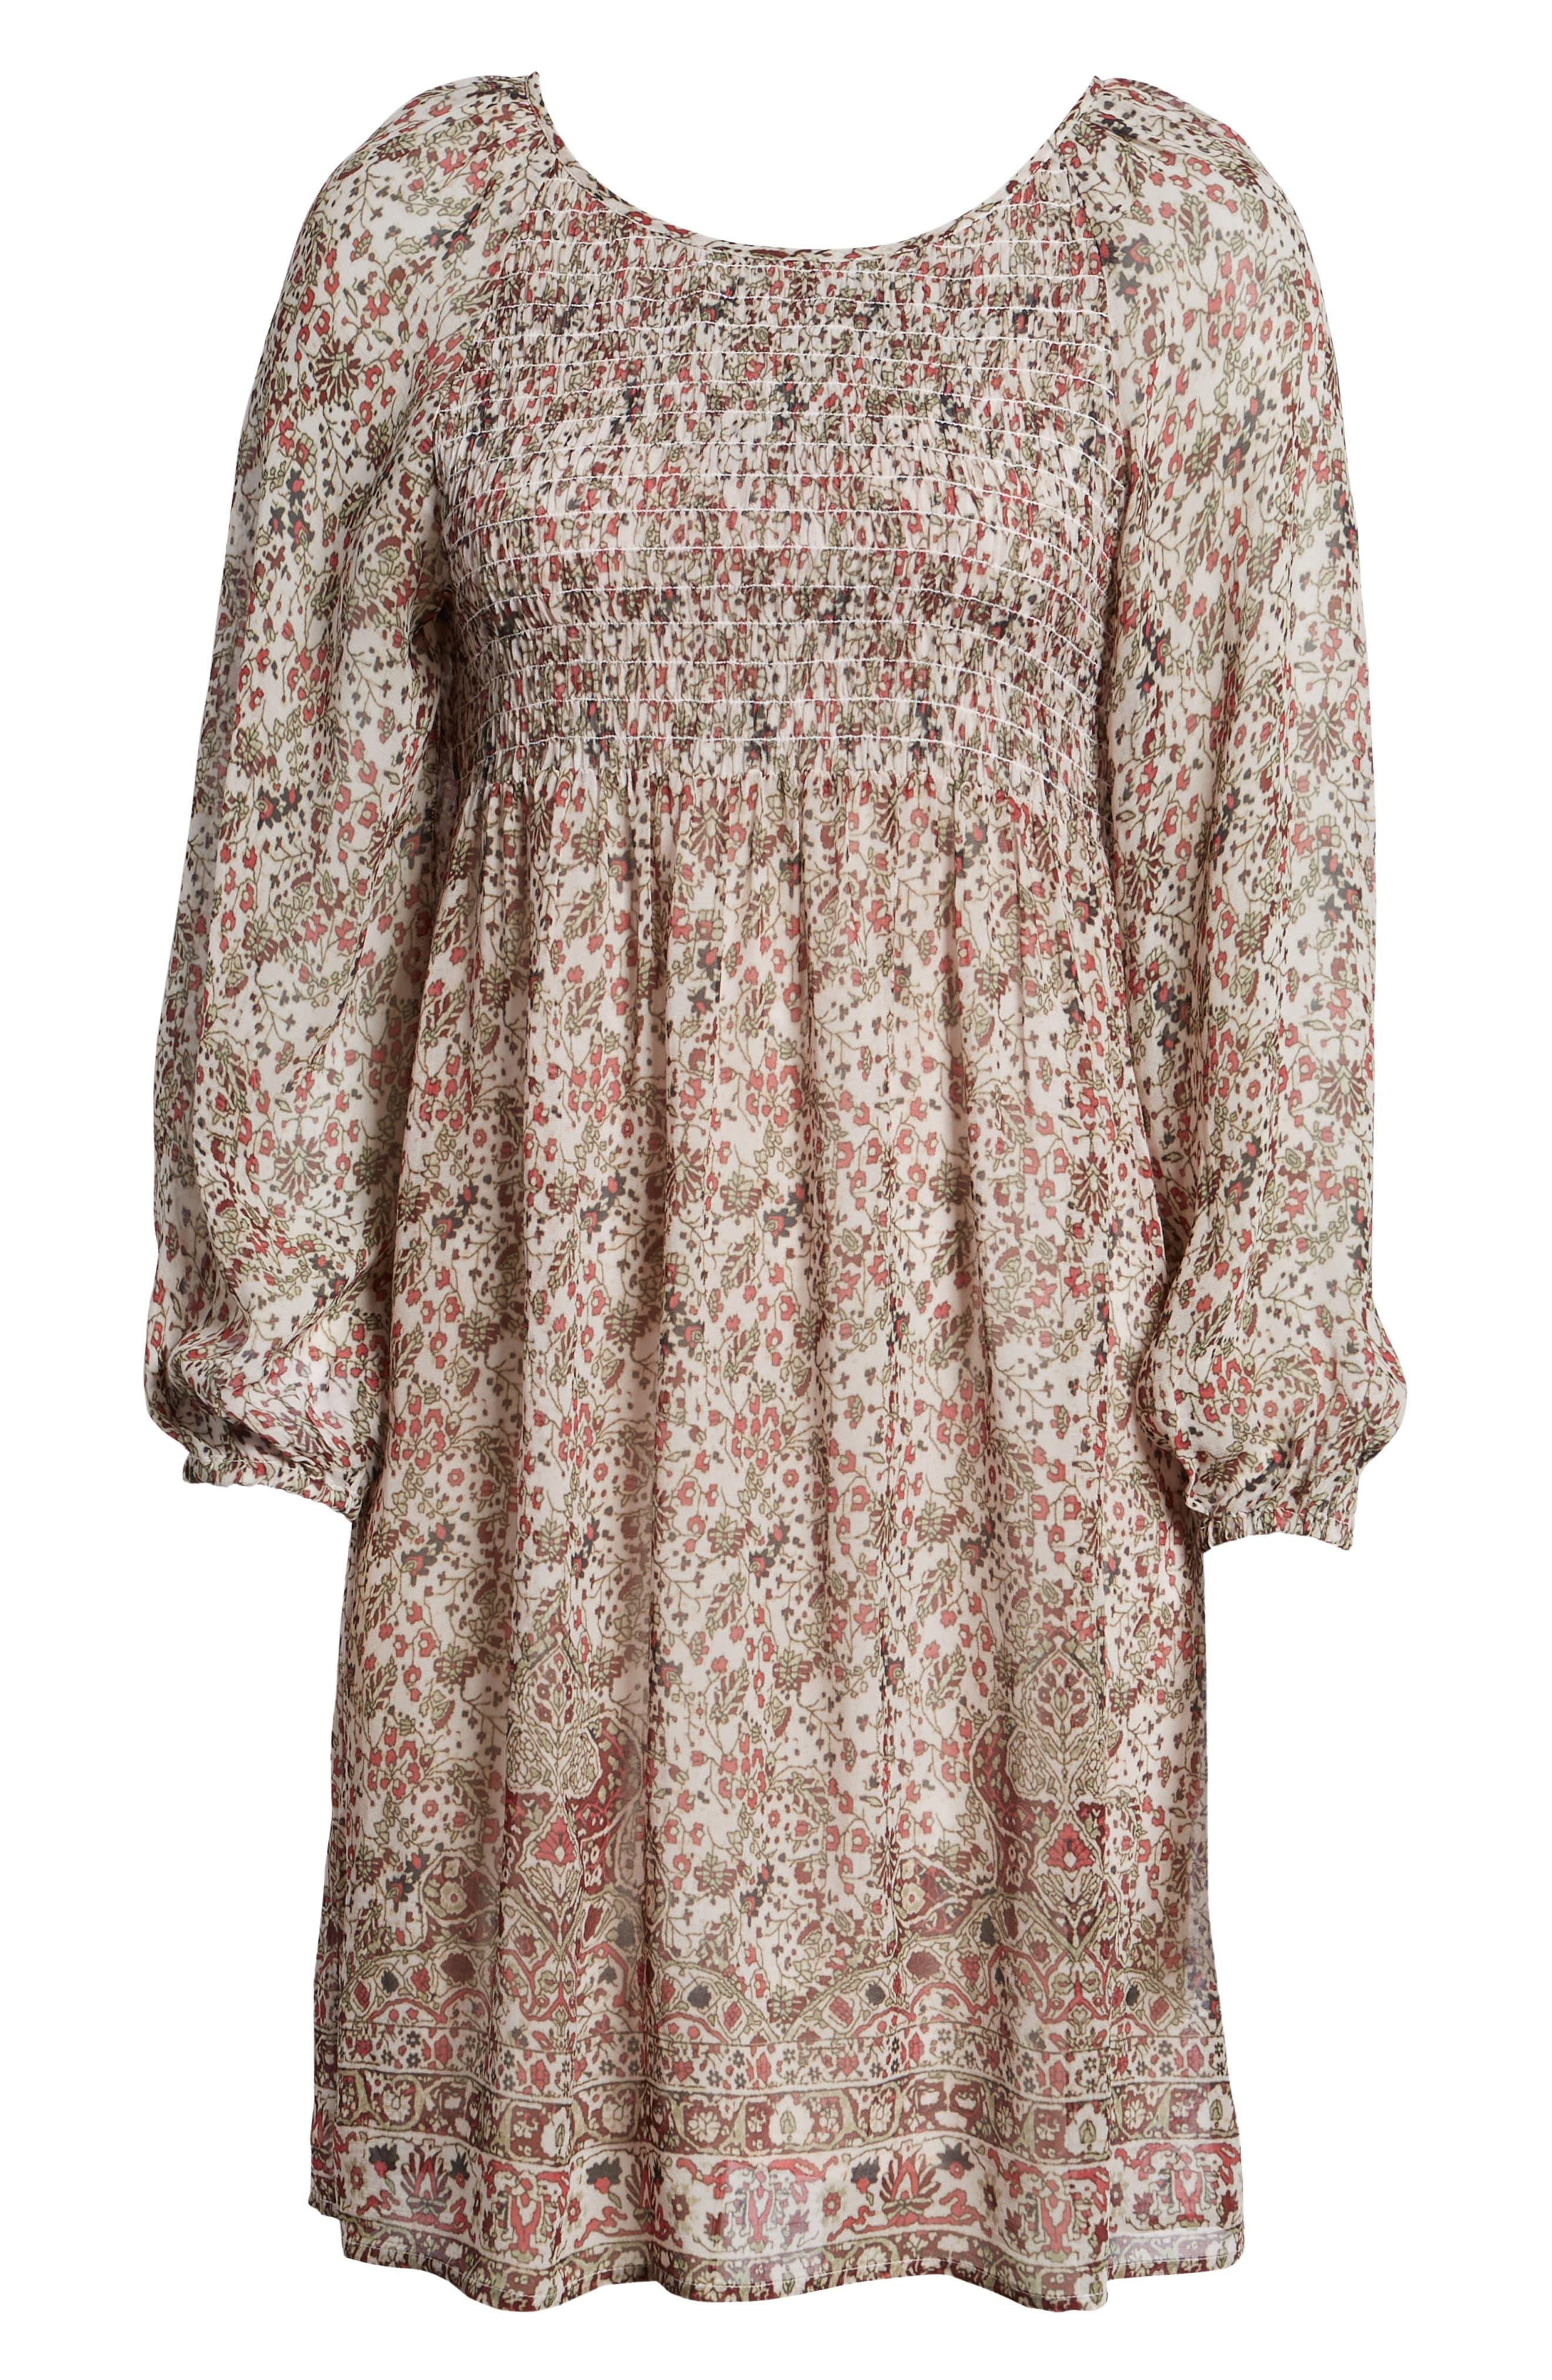 Sebastian Printed Smocked Dress,                             Alternate thumbnail 6, color,                             Multi